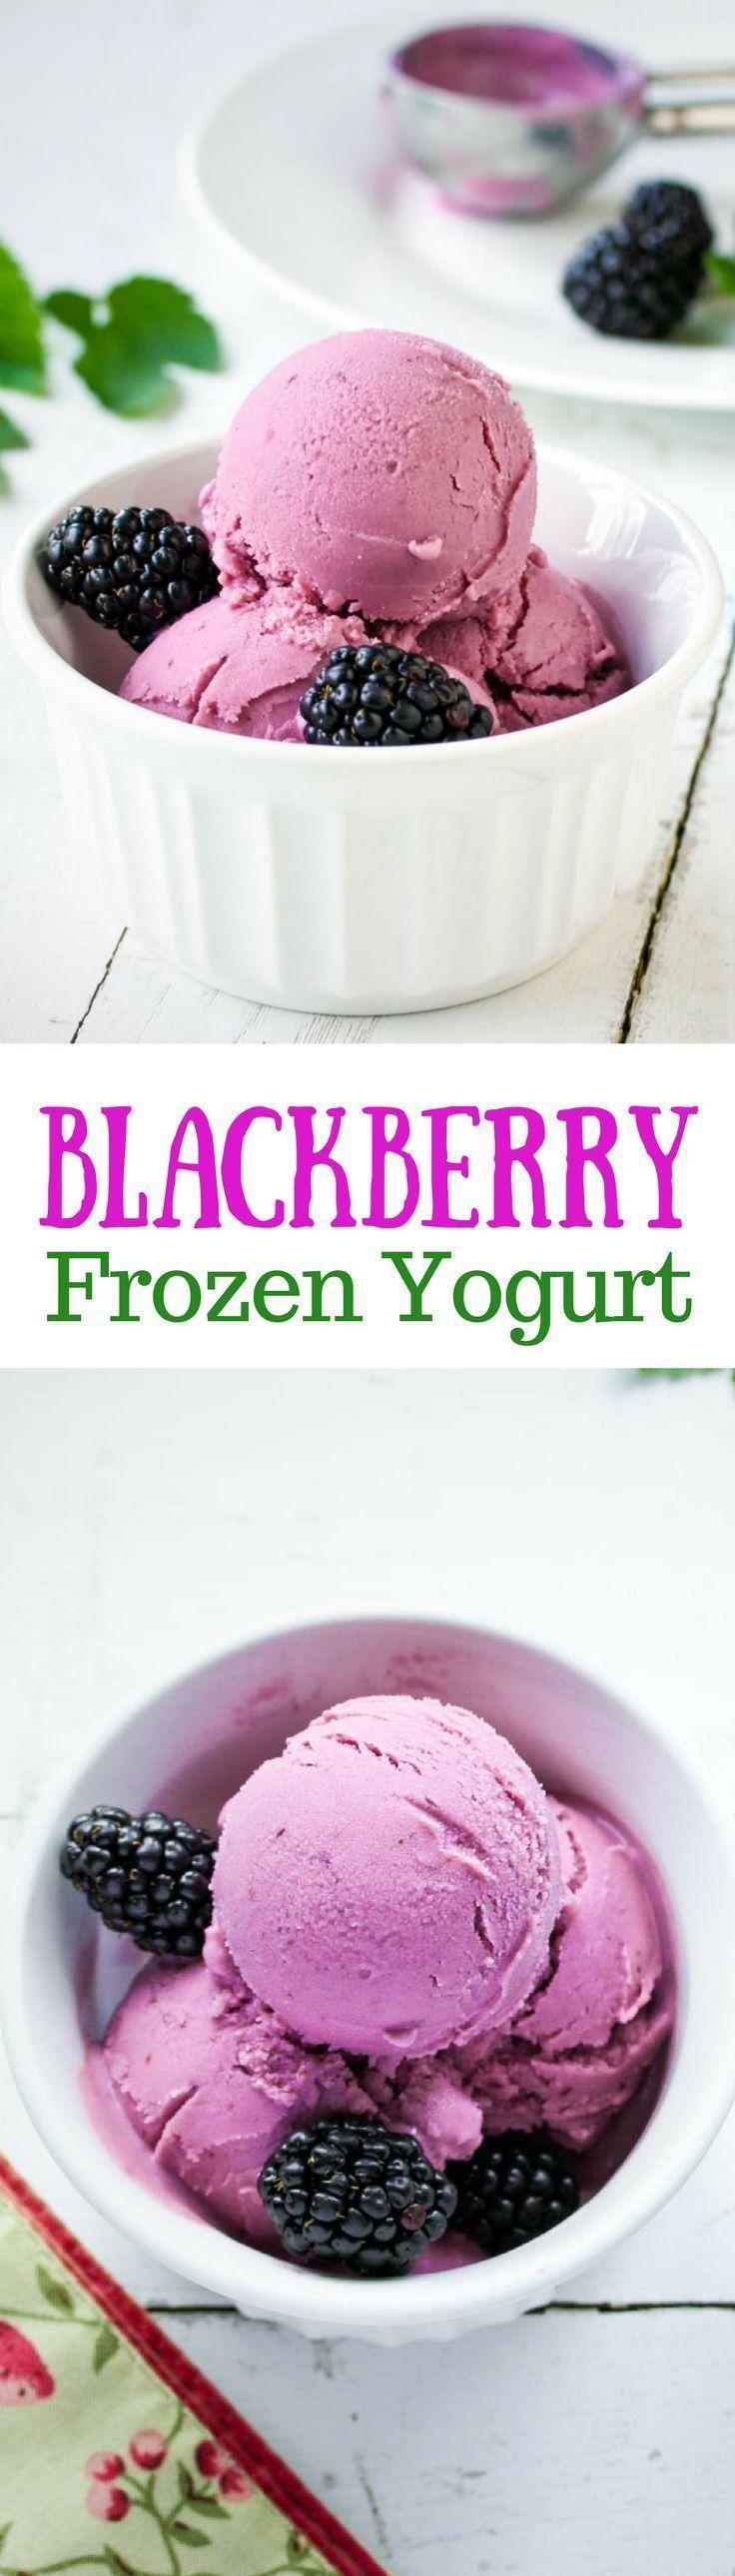 Blackberry Frozen Yogurt - a healthy way to enjoy a frozen dessert, sweetened with blackberries and honey www.savingdessert.com